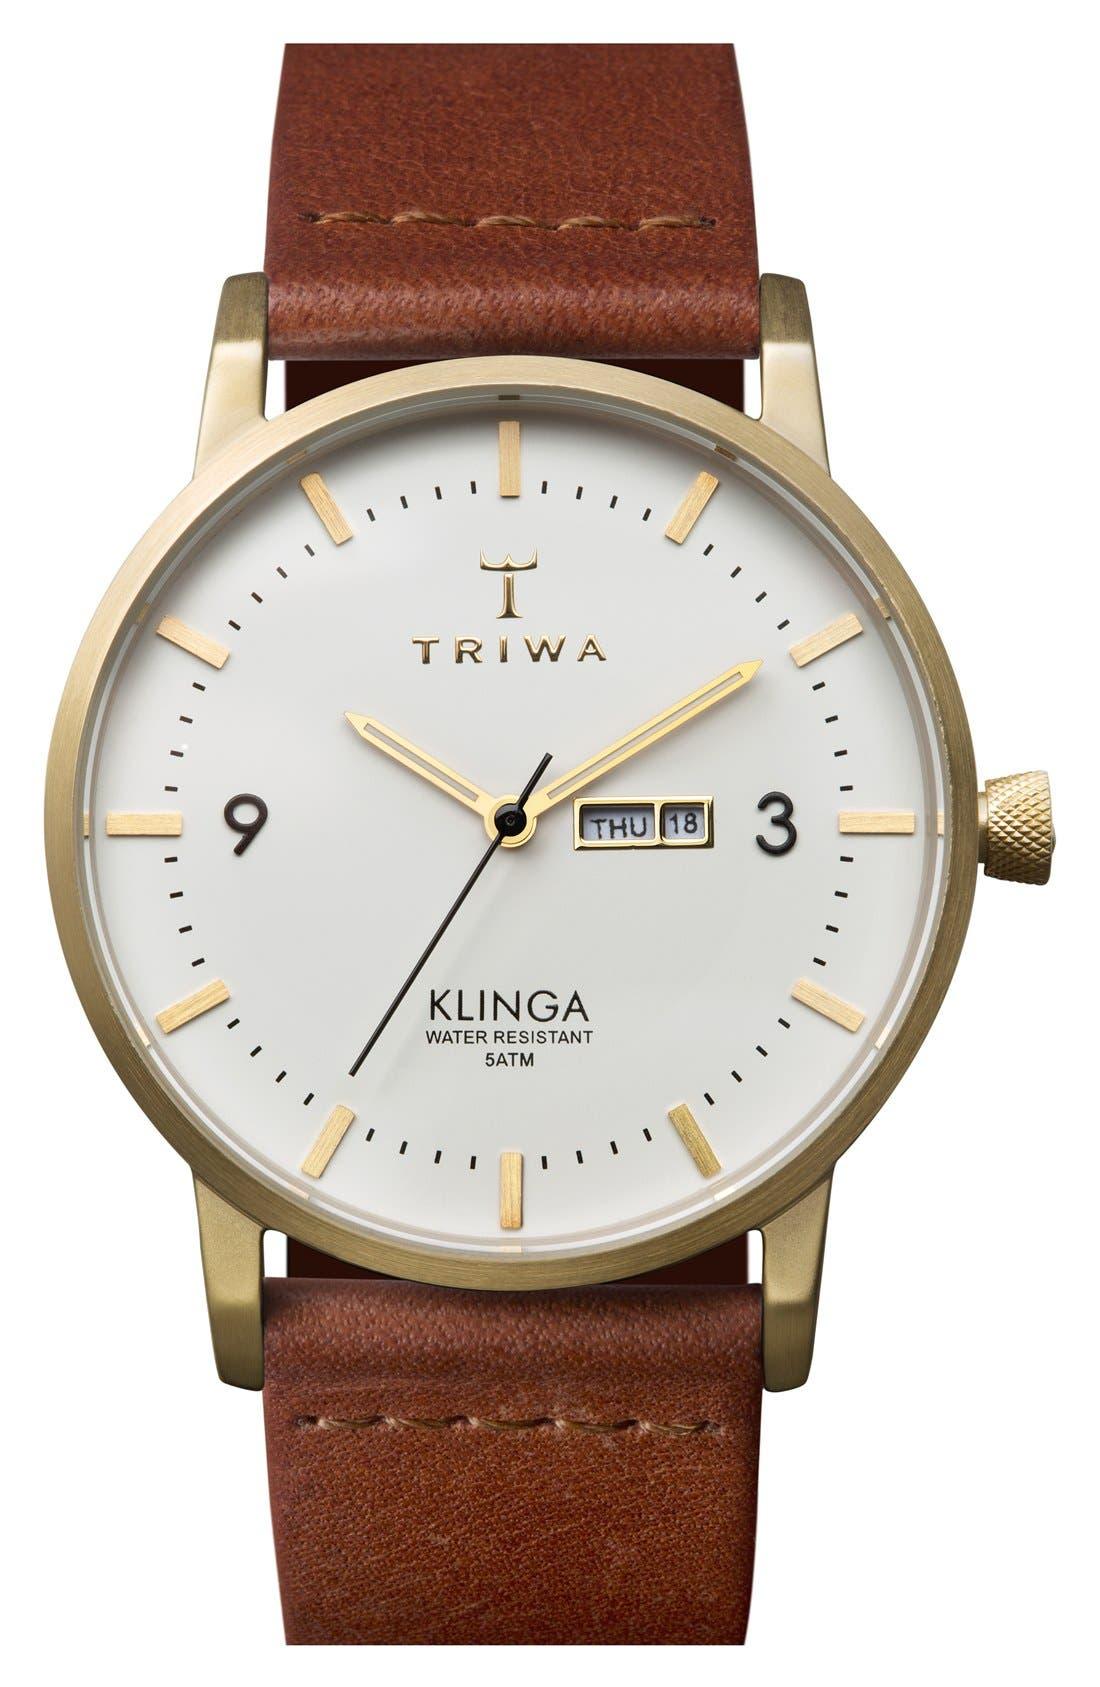 Main Image - Triwa Klinga Organic Leather Strap Watch, 38mm